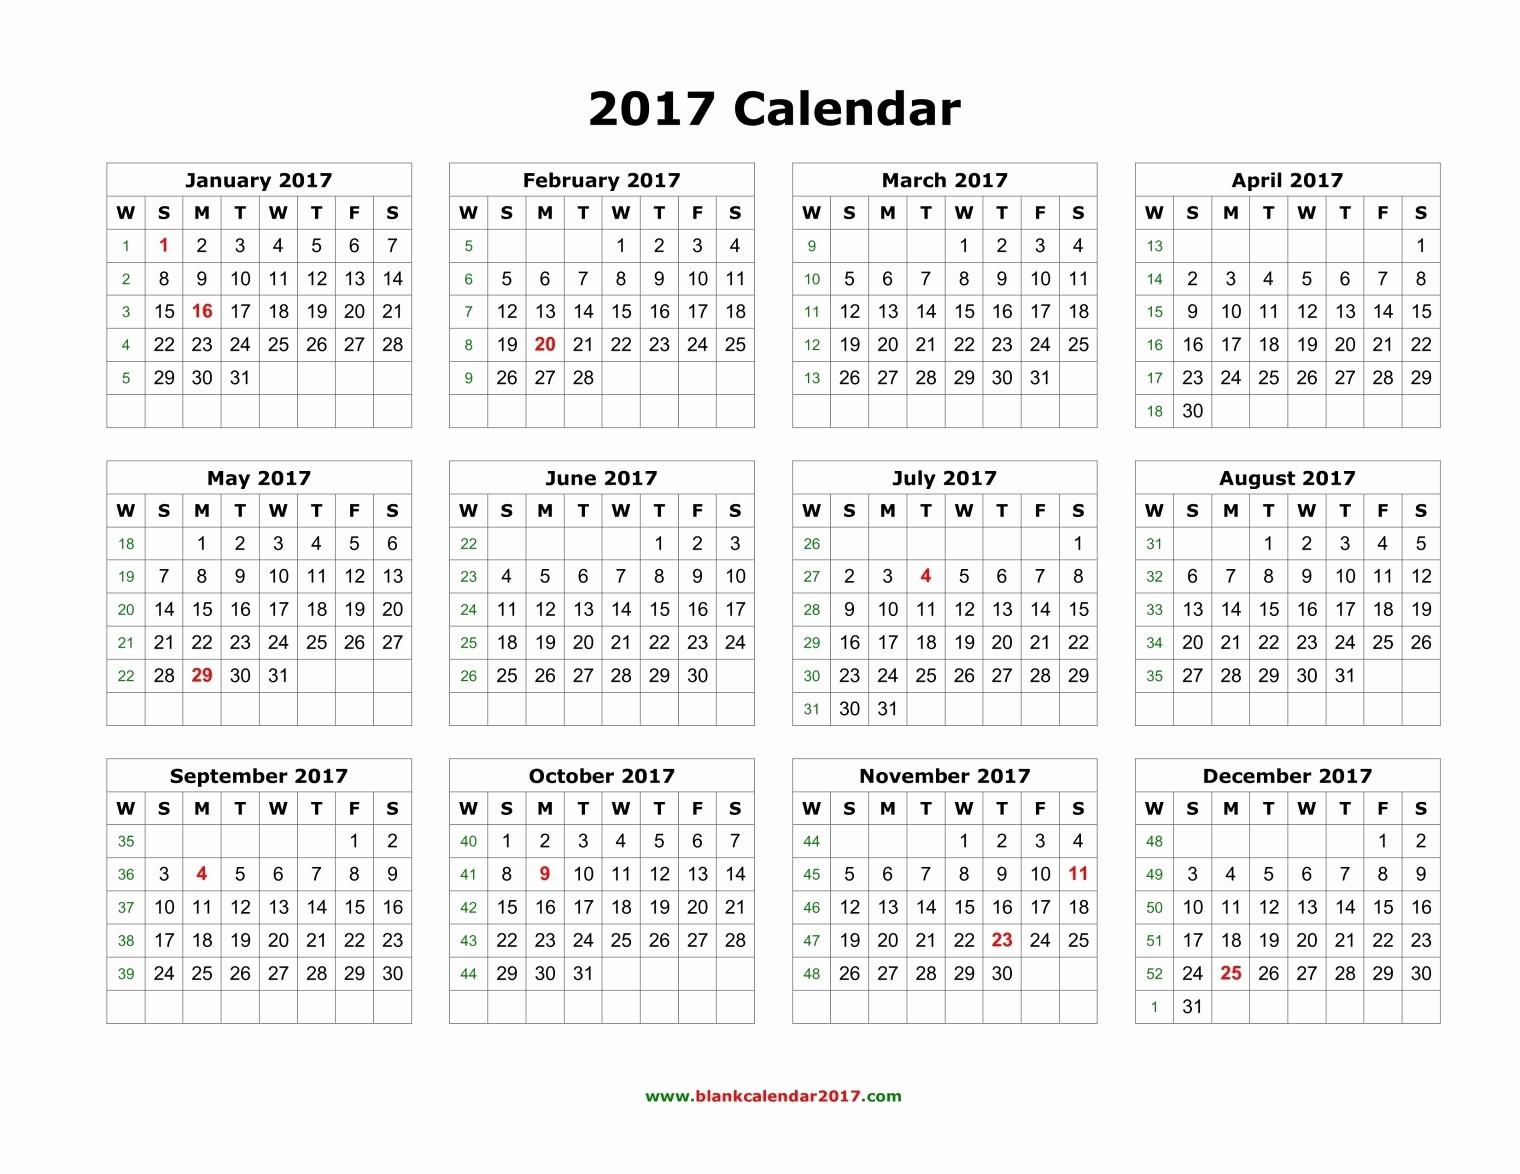 Free 2017 Printable Calendar Word New 2017 Printable Calendar Word